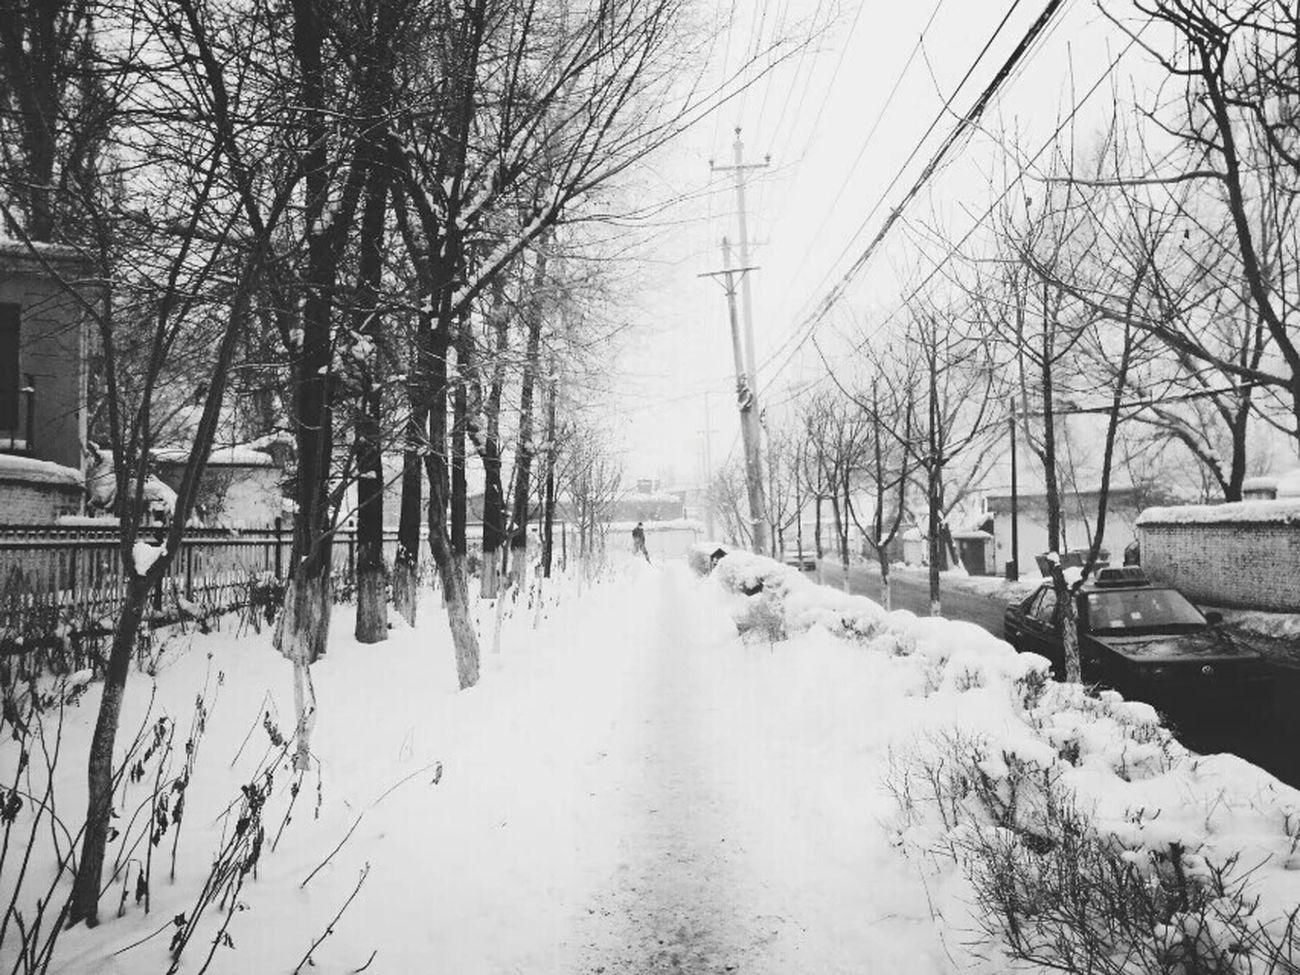 Snow ❄ 乌鲁木齐Black & White Taking Photos Beautiful ♥ Enjoying Life Happy Day EyeEm The Best Shots Have A Nice Day♥ Eye For Photography